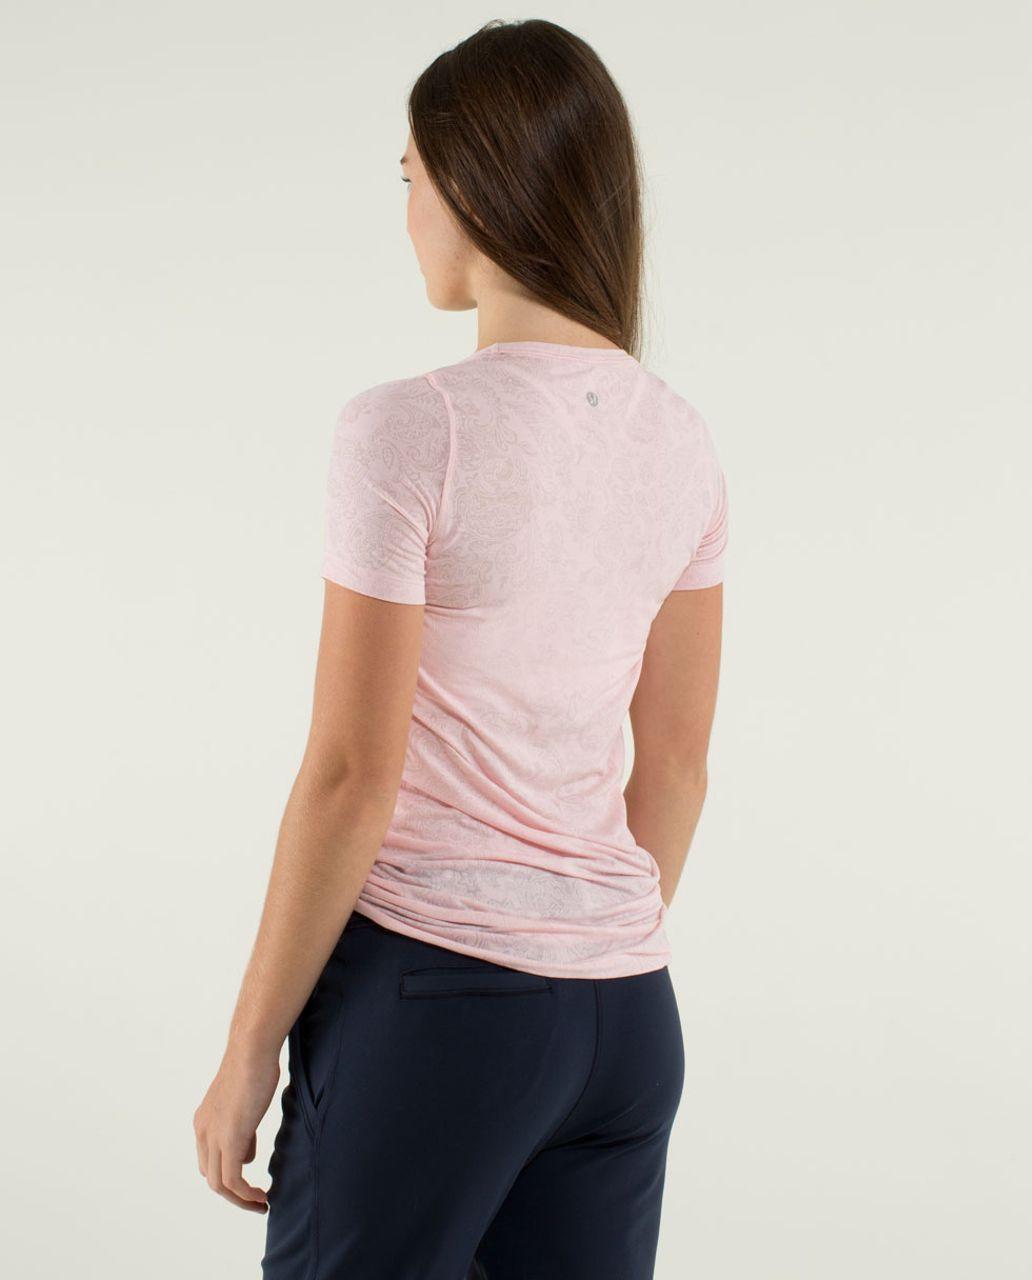 Lululemon Karmady Short Sleeve - Paisley Burnout Pretty Pink